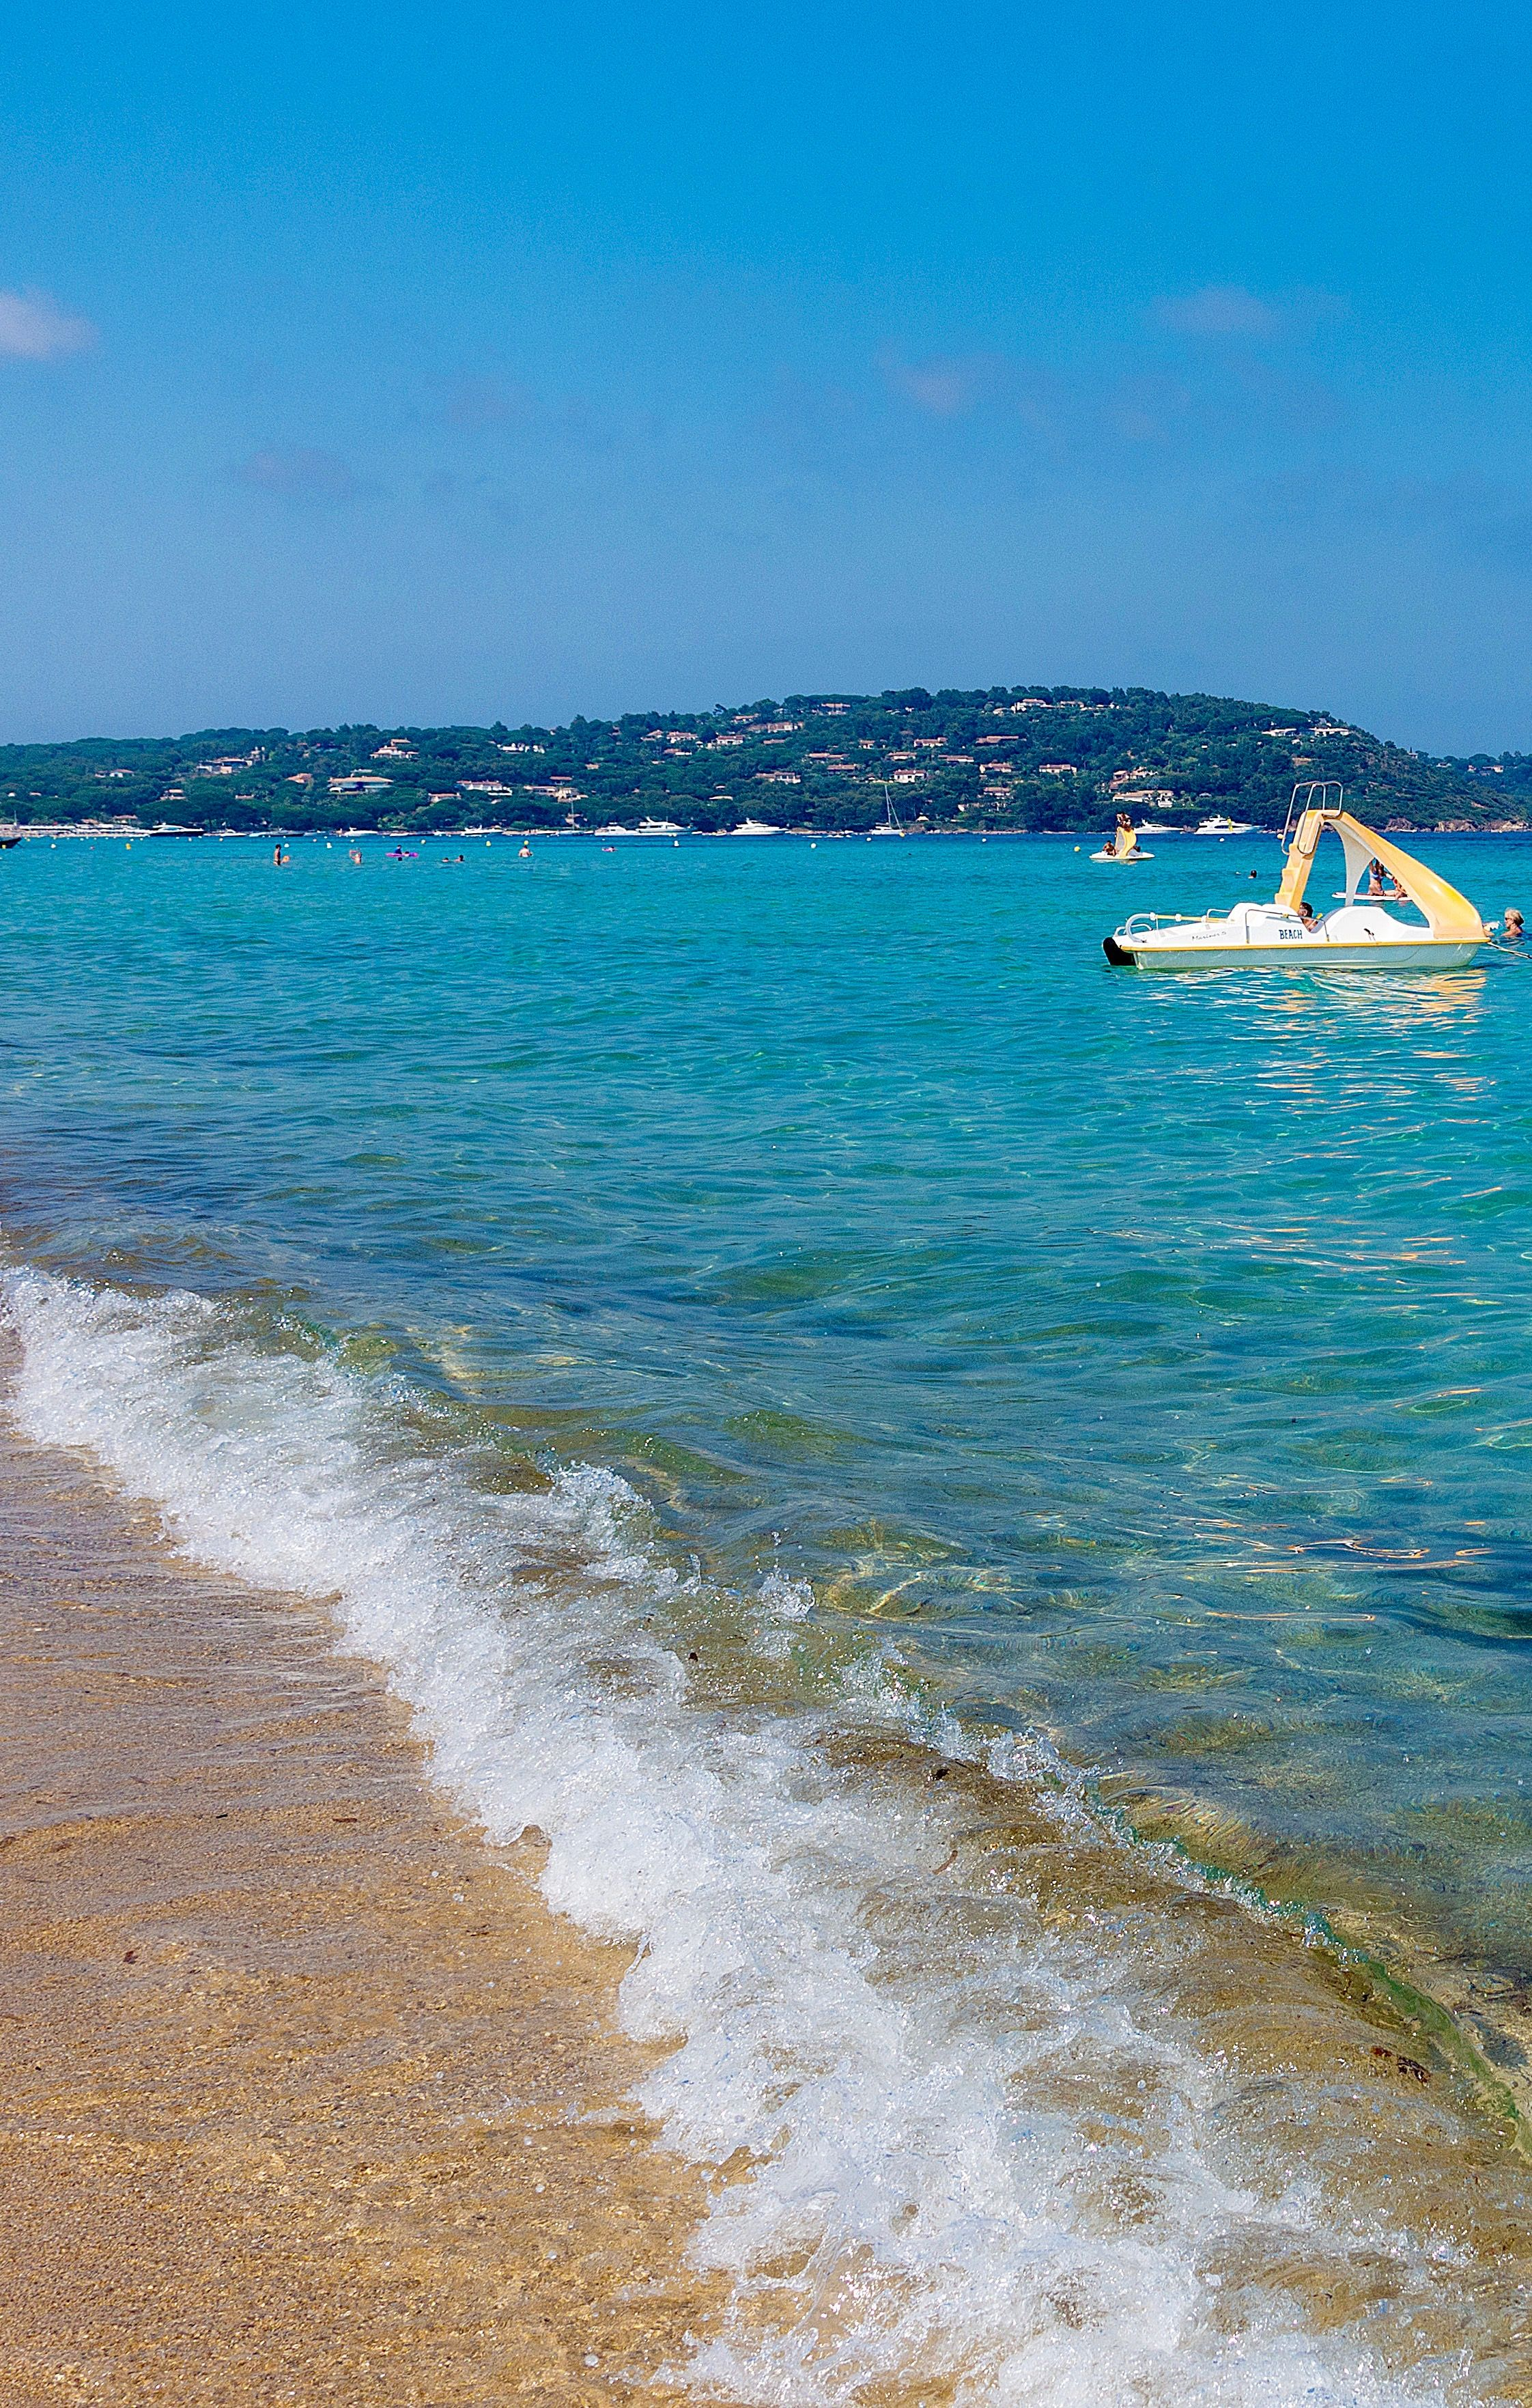 saint-tropez-french-riviera-beach-france-travel-style-38-1